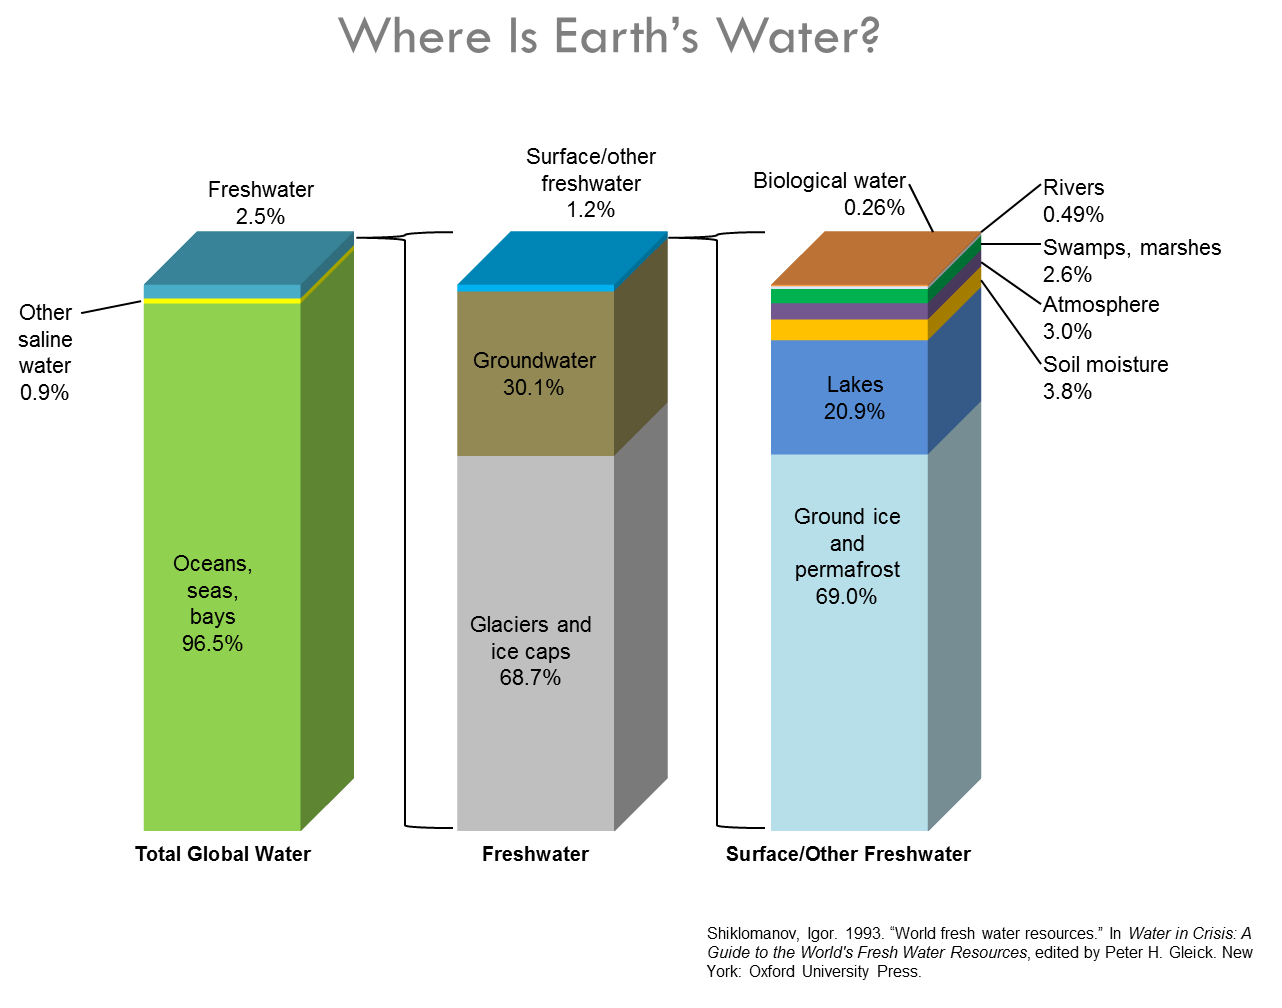 earthswater